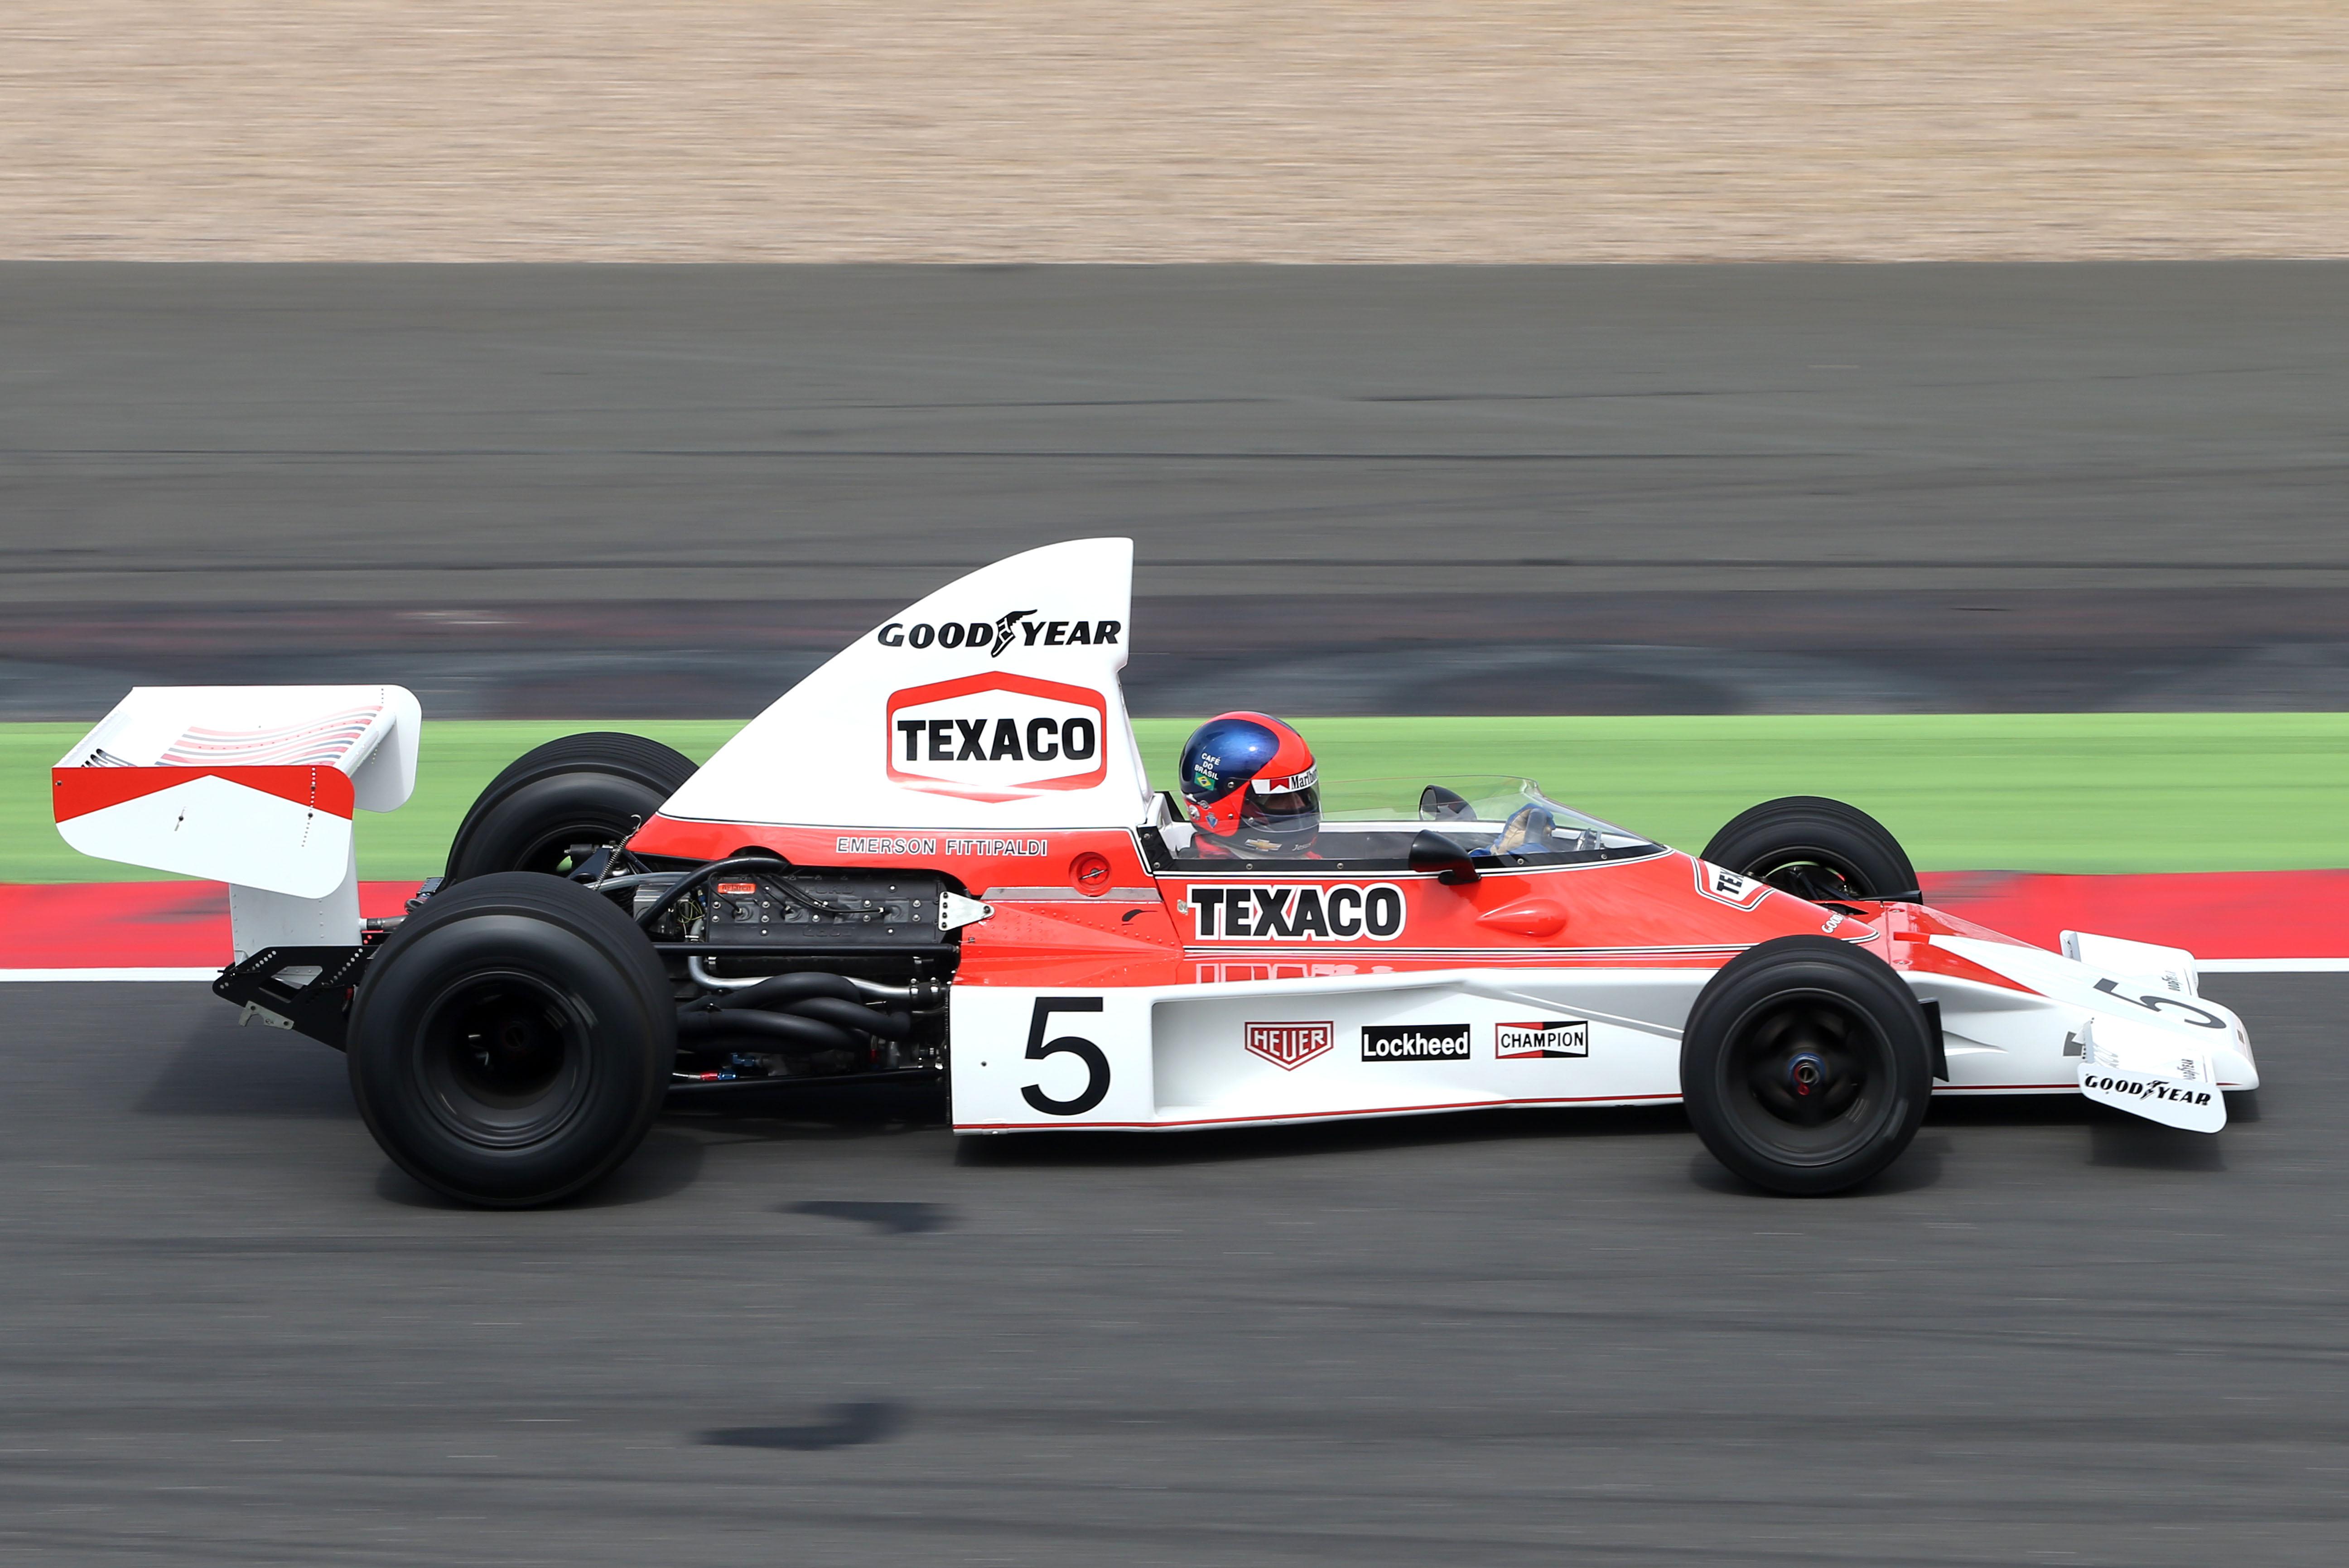 Emerson Fittipaldi The Race Legends Trophy McLaren Silverstone 2014